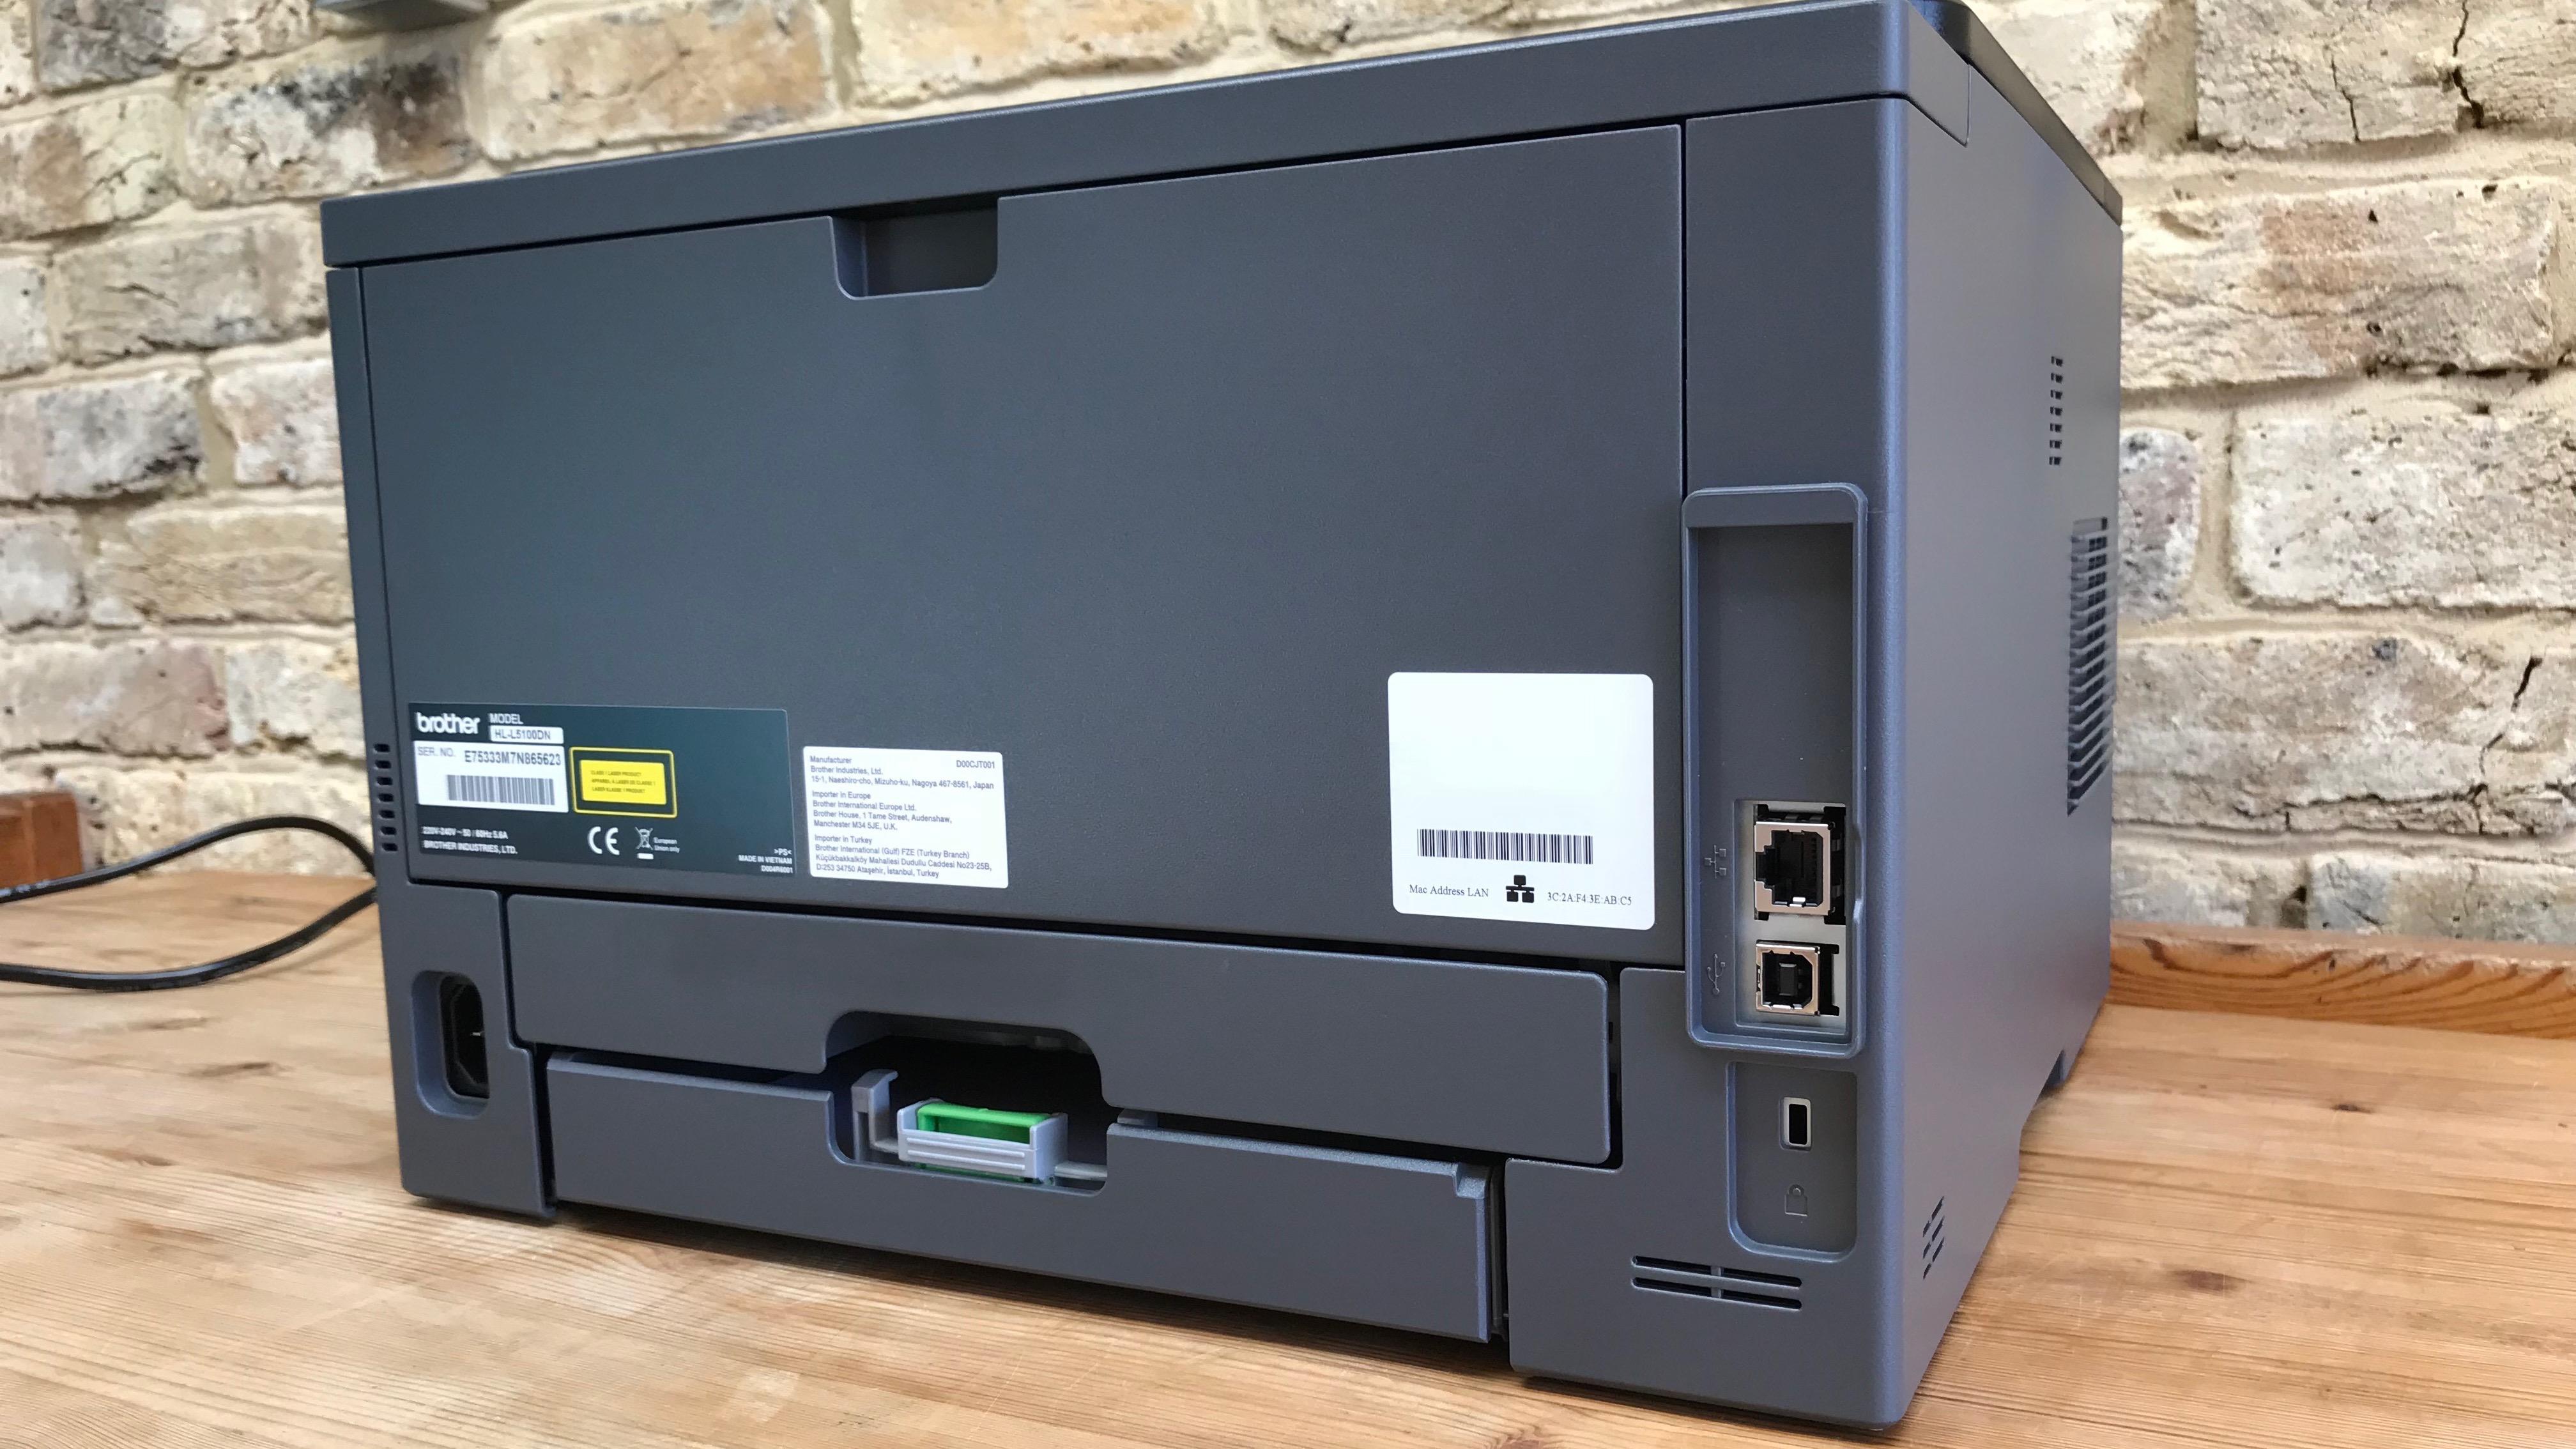 rear of printer